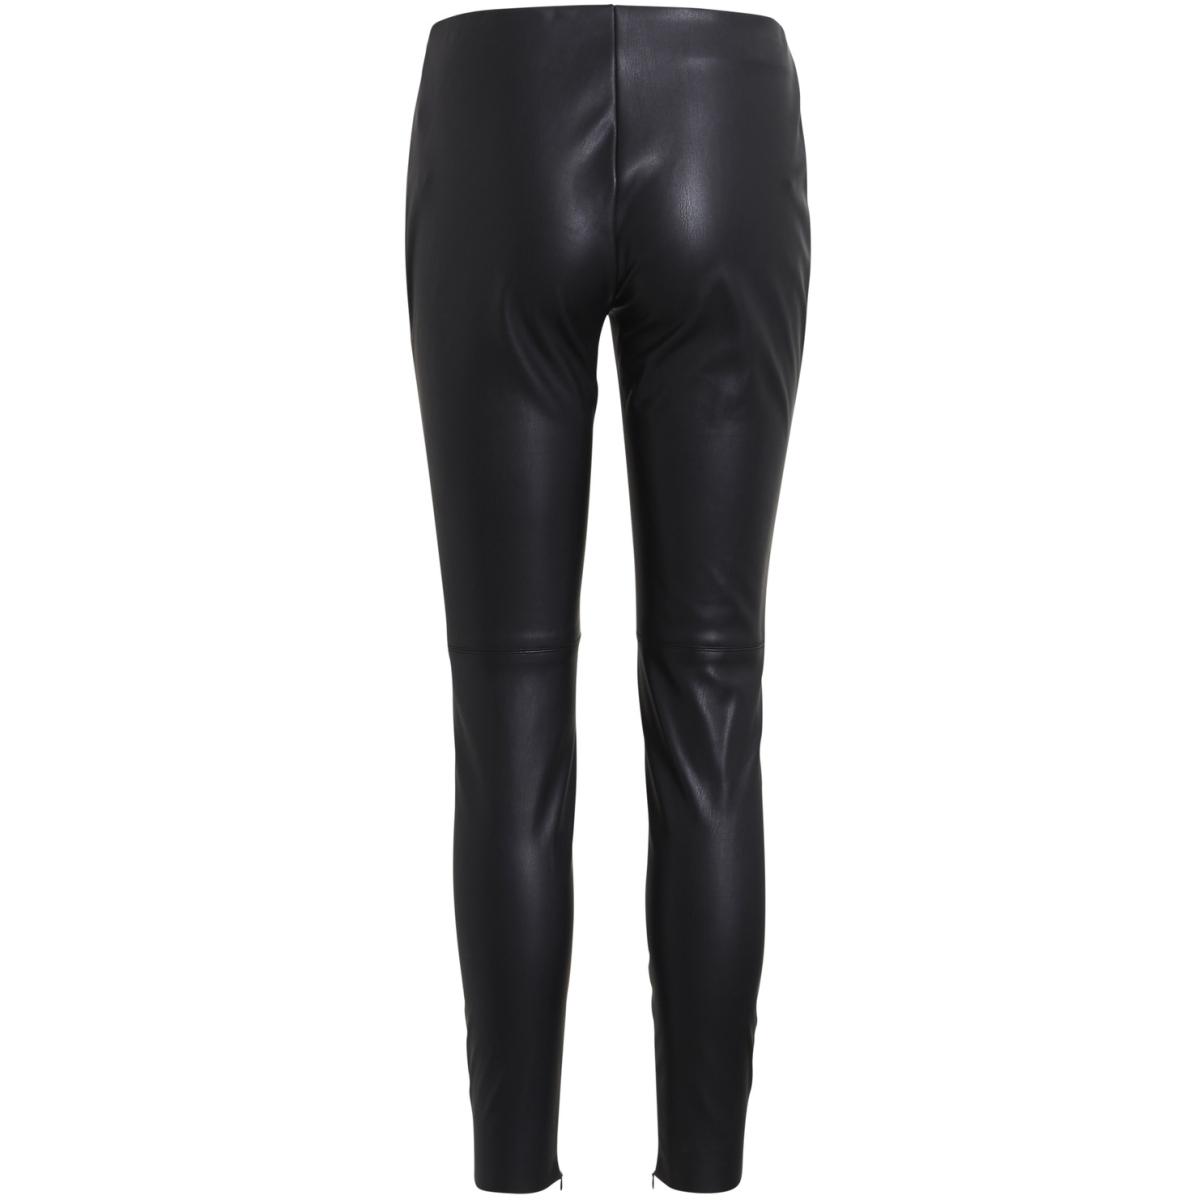 vipeni 7/8 legging-noos 14043982 vila legging black